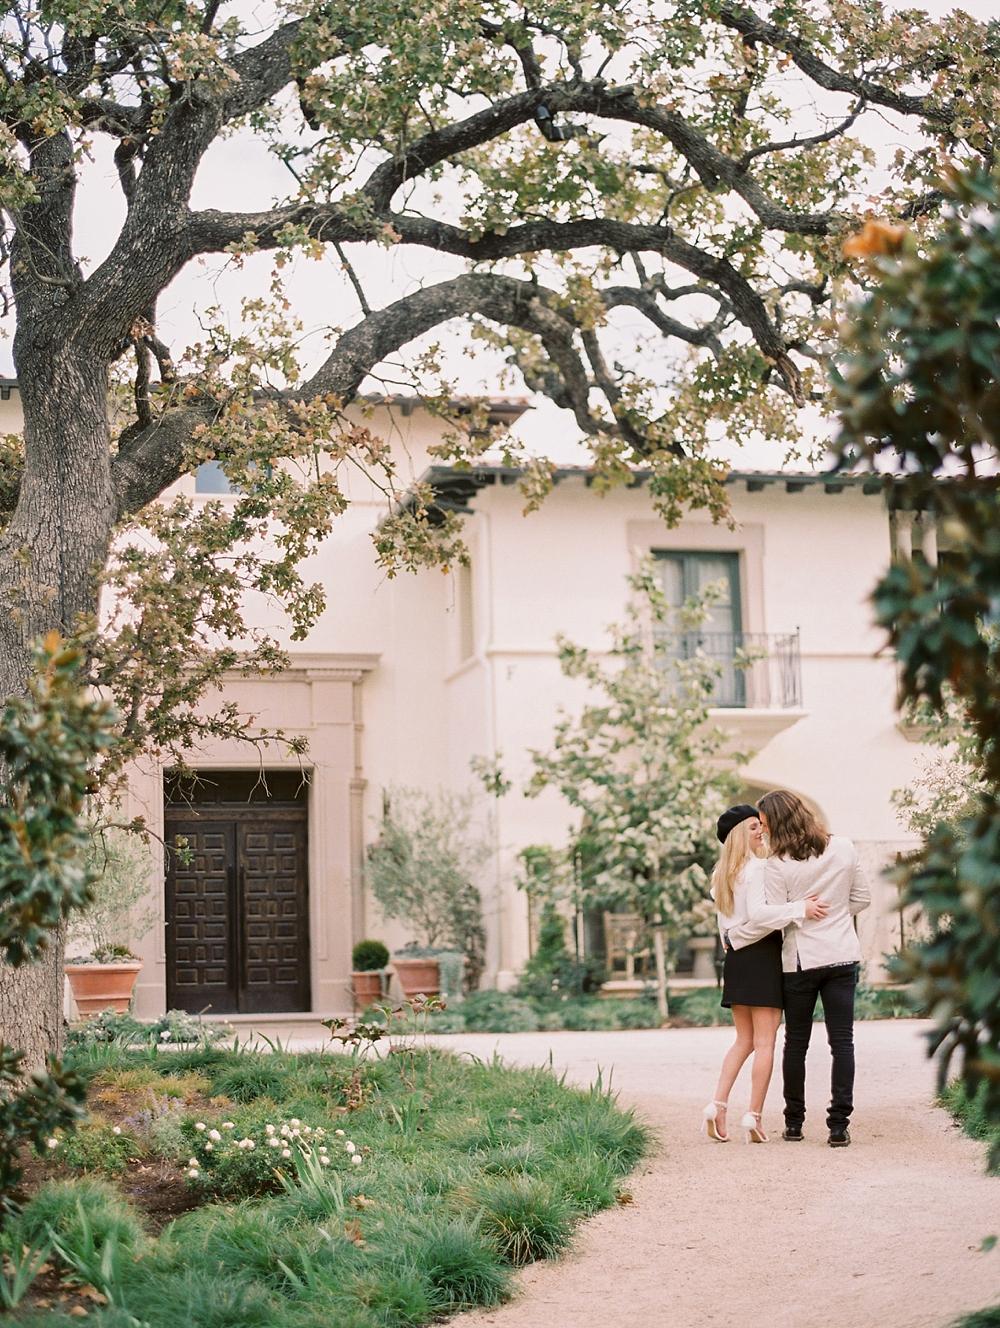 kristin-la-voie-photography-Austin-Wedding-Boudoir-Photographer-Commodore-Perry-Estate-33